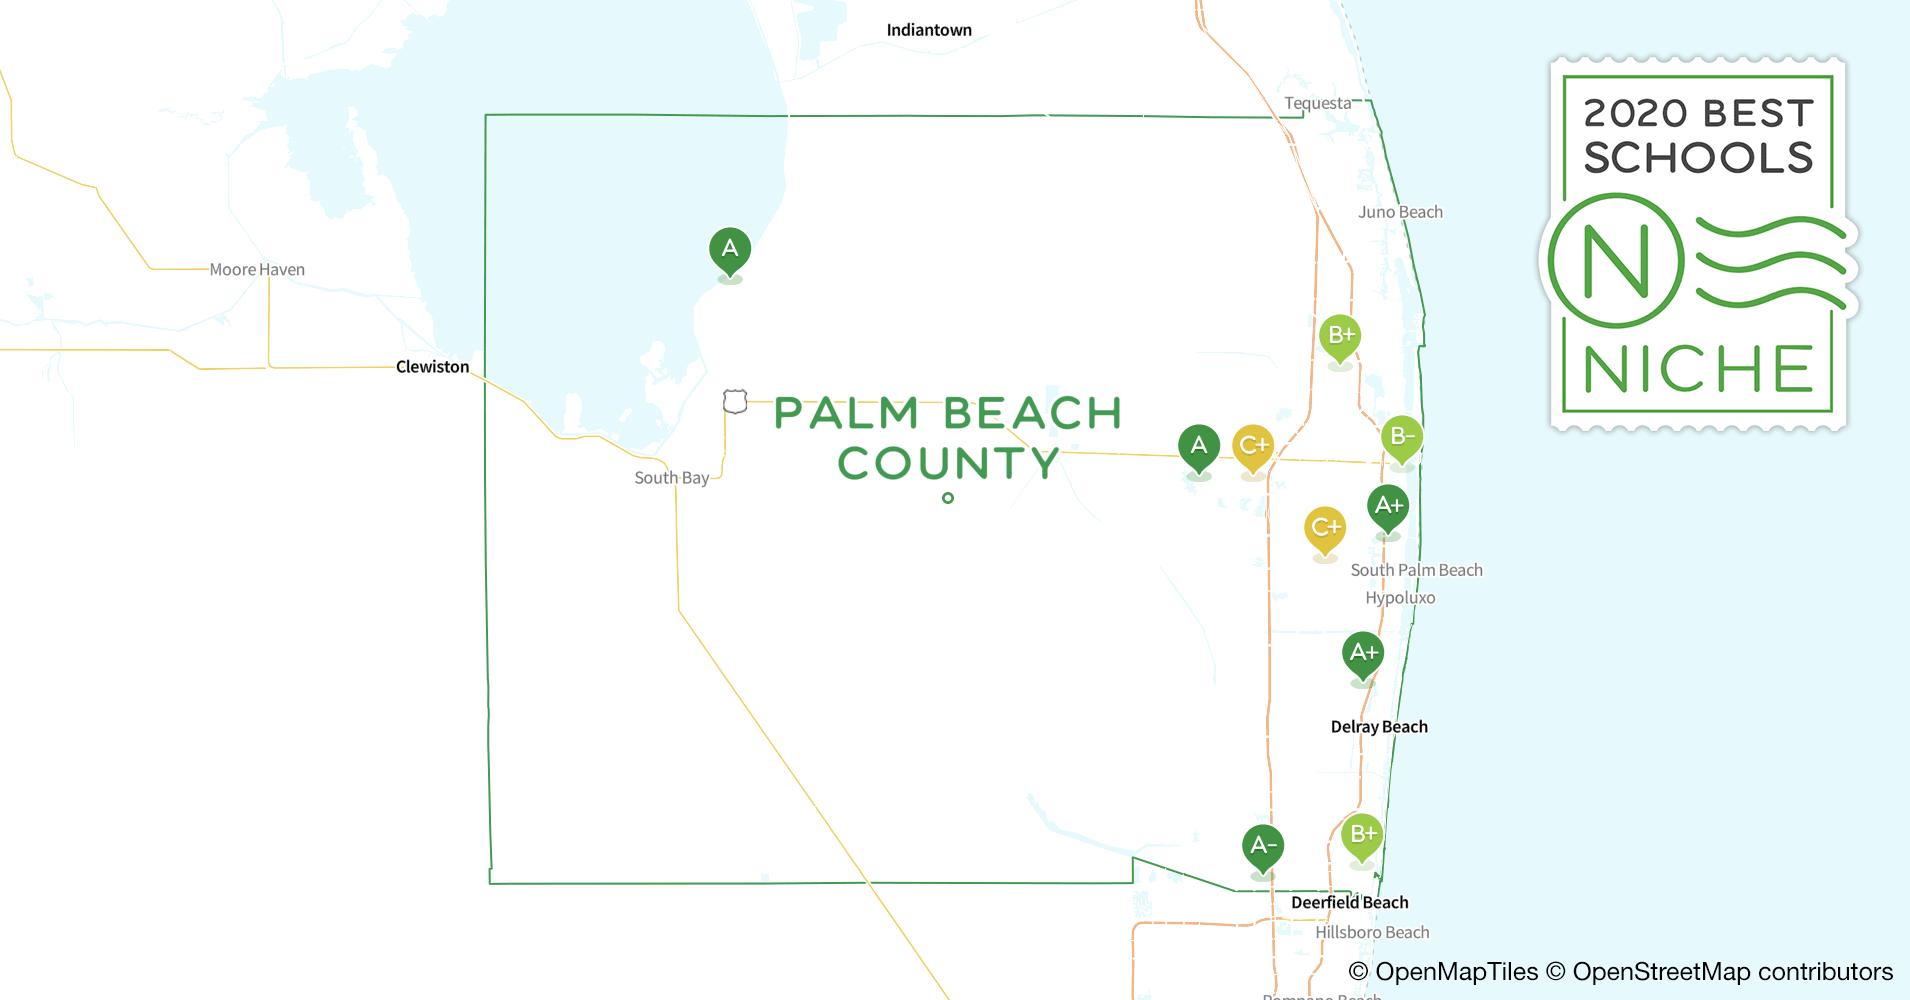 2020 Best Public Middle Schools in Palm Beach County, FL - Niche